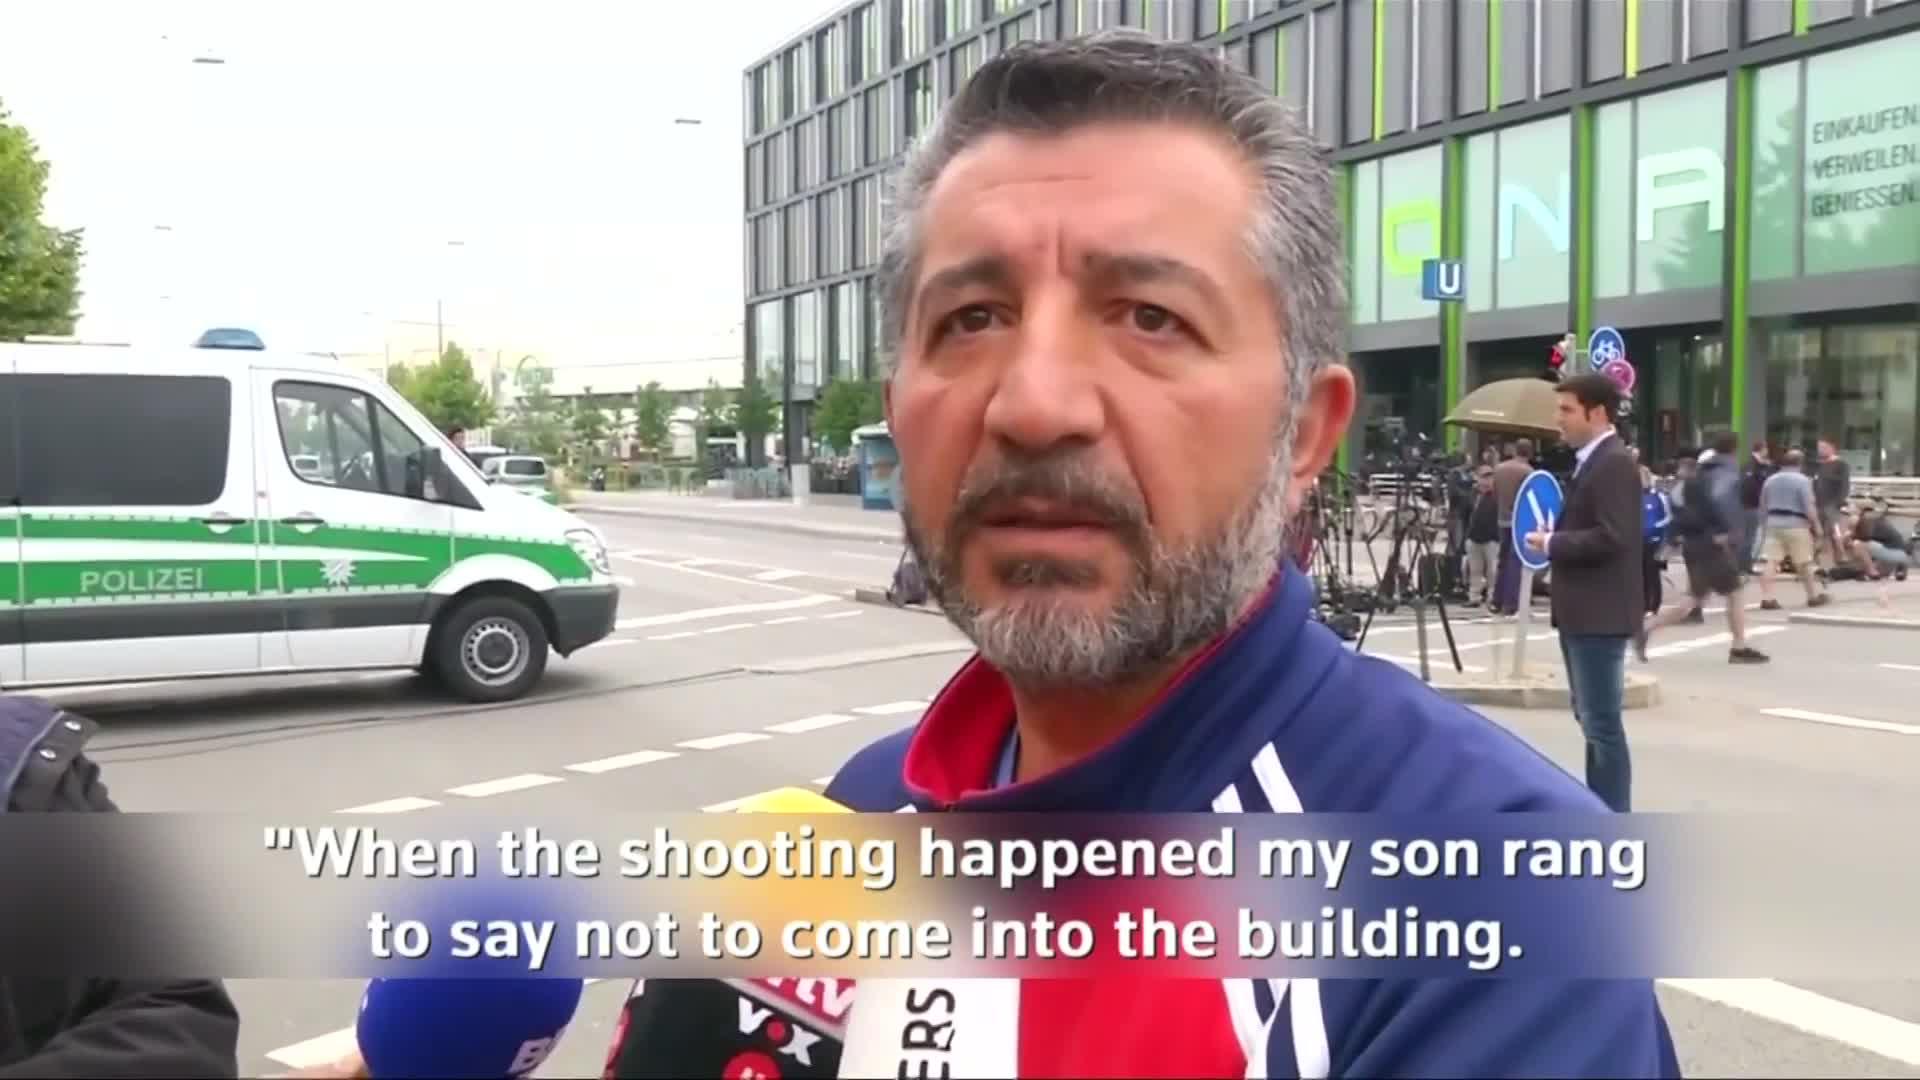 Munich attack witnesses describe 'bloodbath'